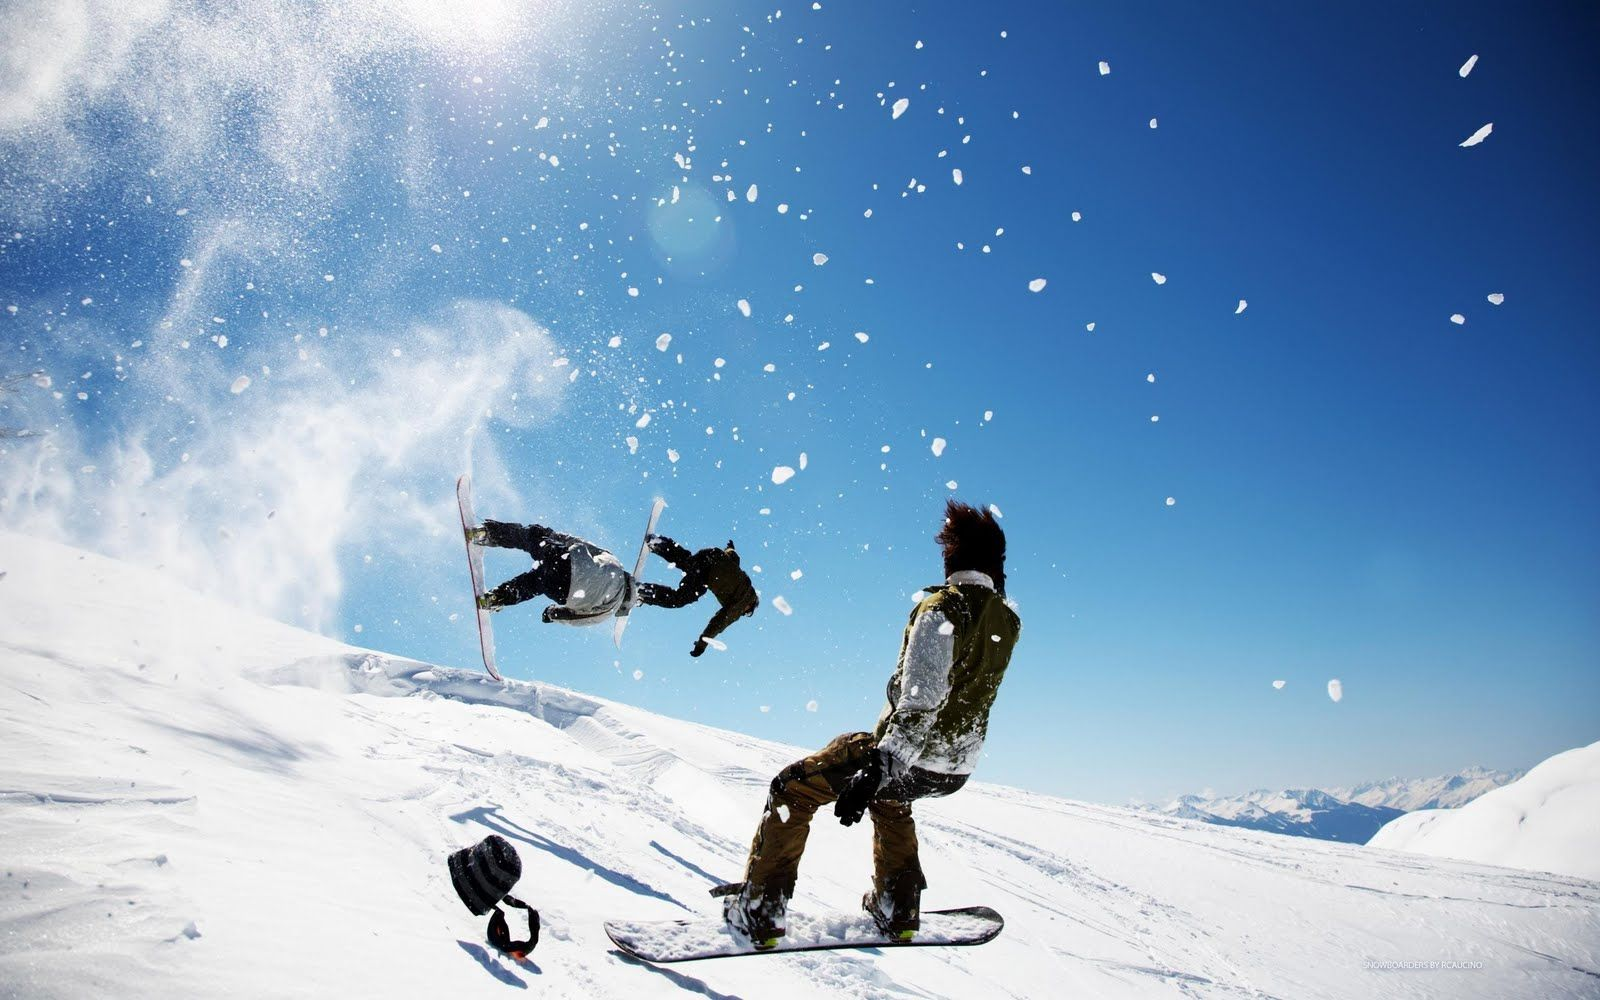 snowboarding wallpaper hd 1600x1000px #890097 | snow boarding